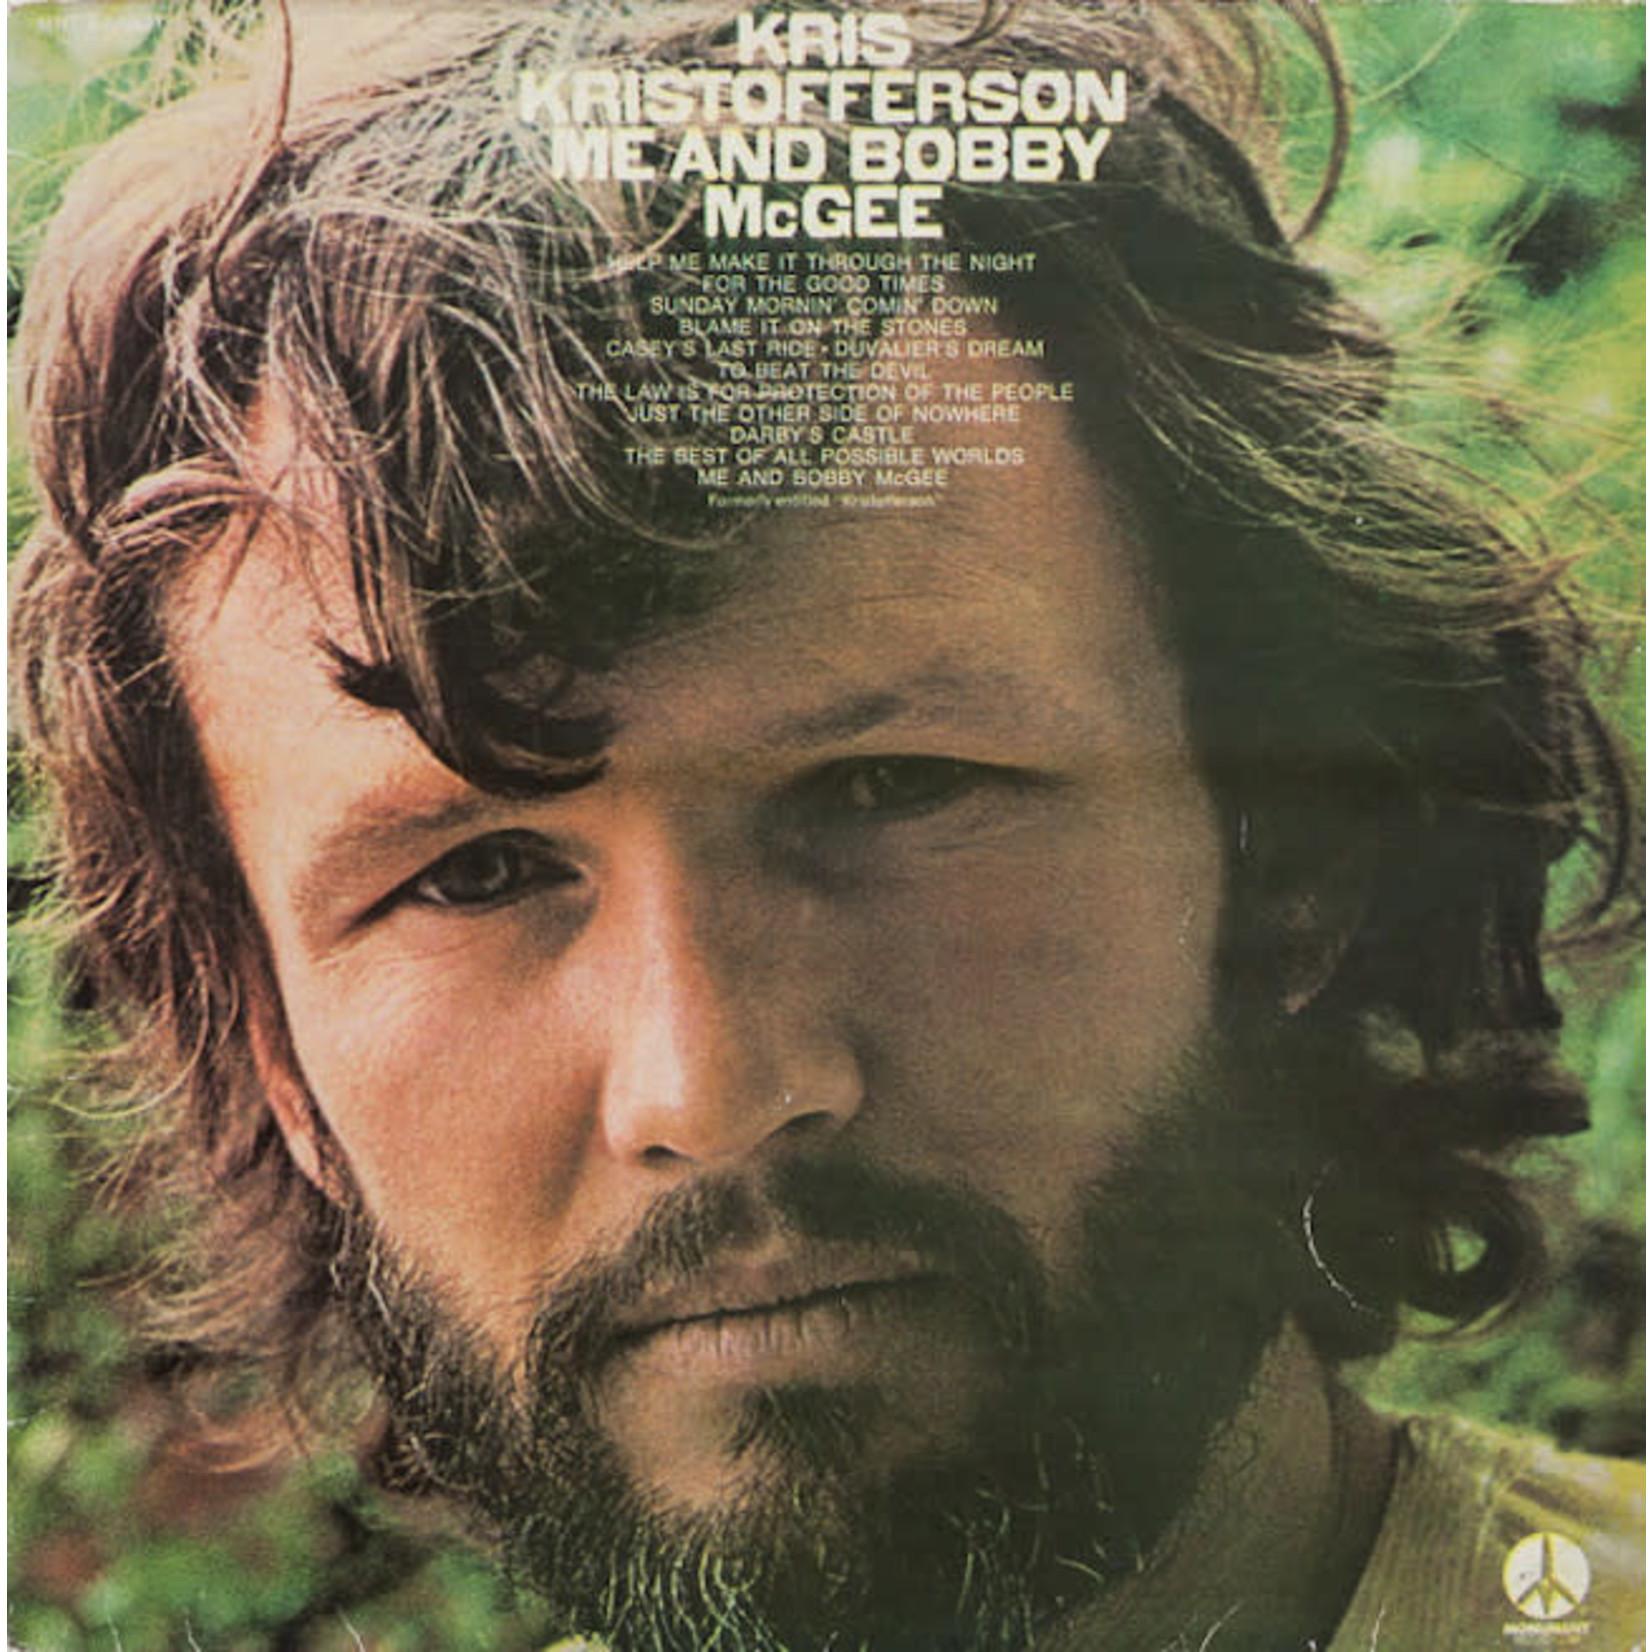 [Vintage] Kristofferson, Kris: Me & Bobby McGee (reissue of 1st LP